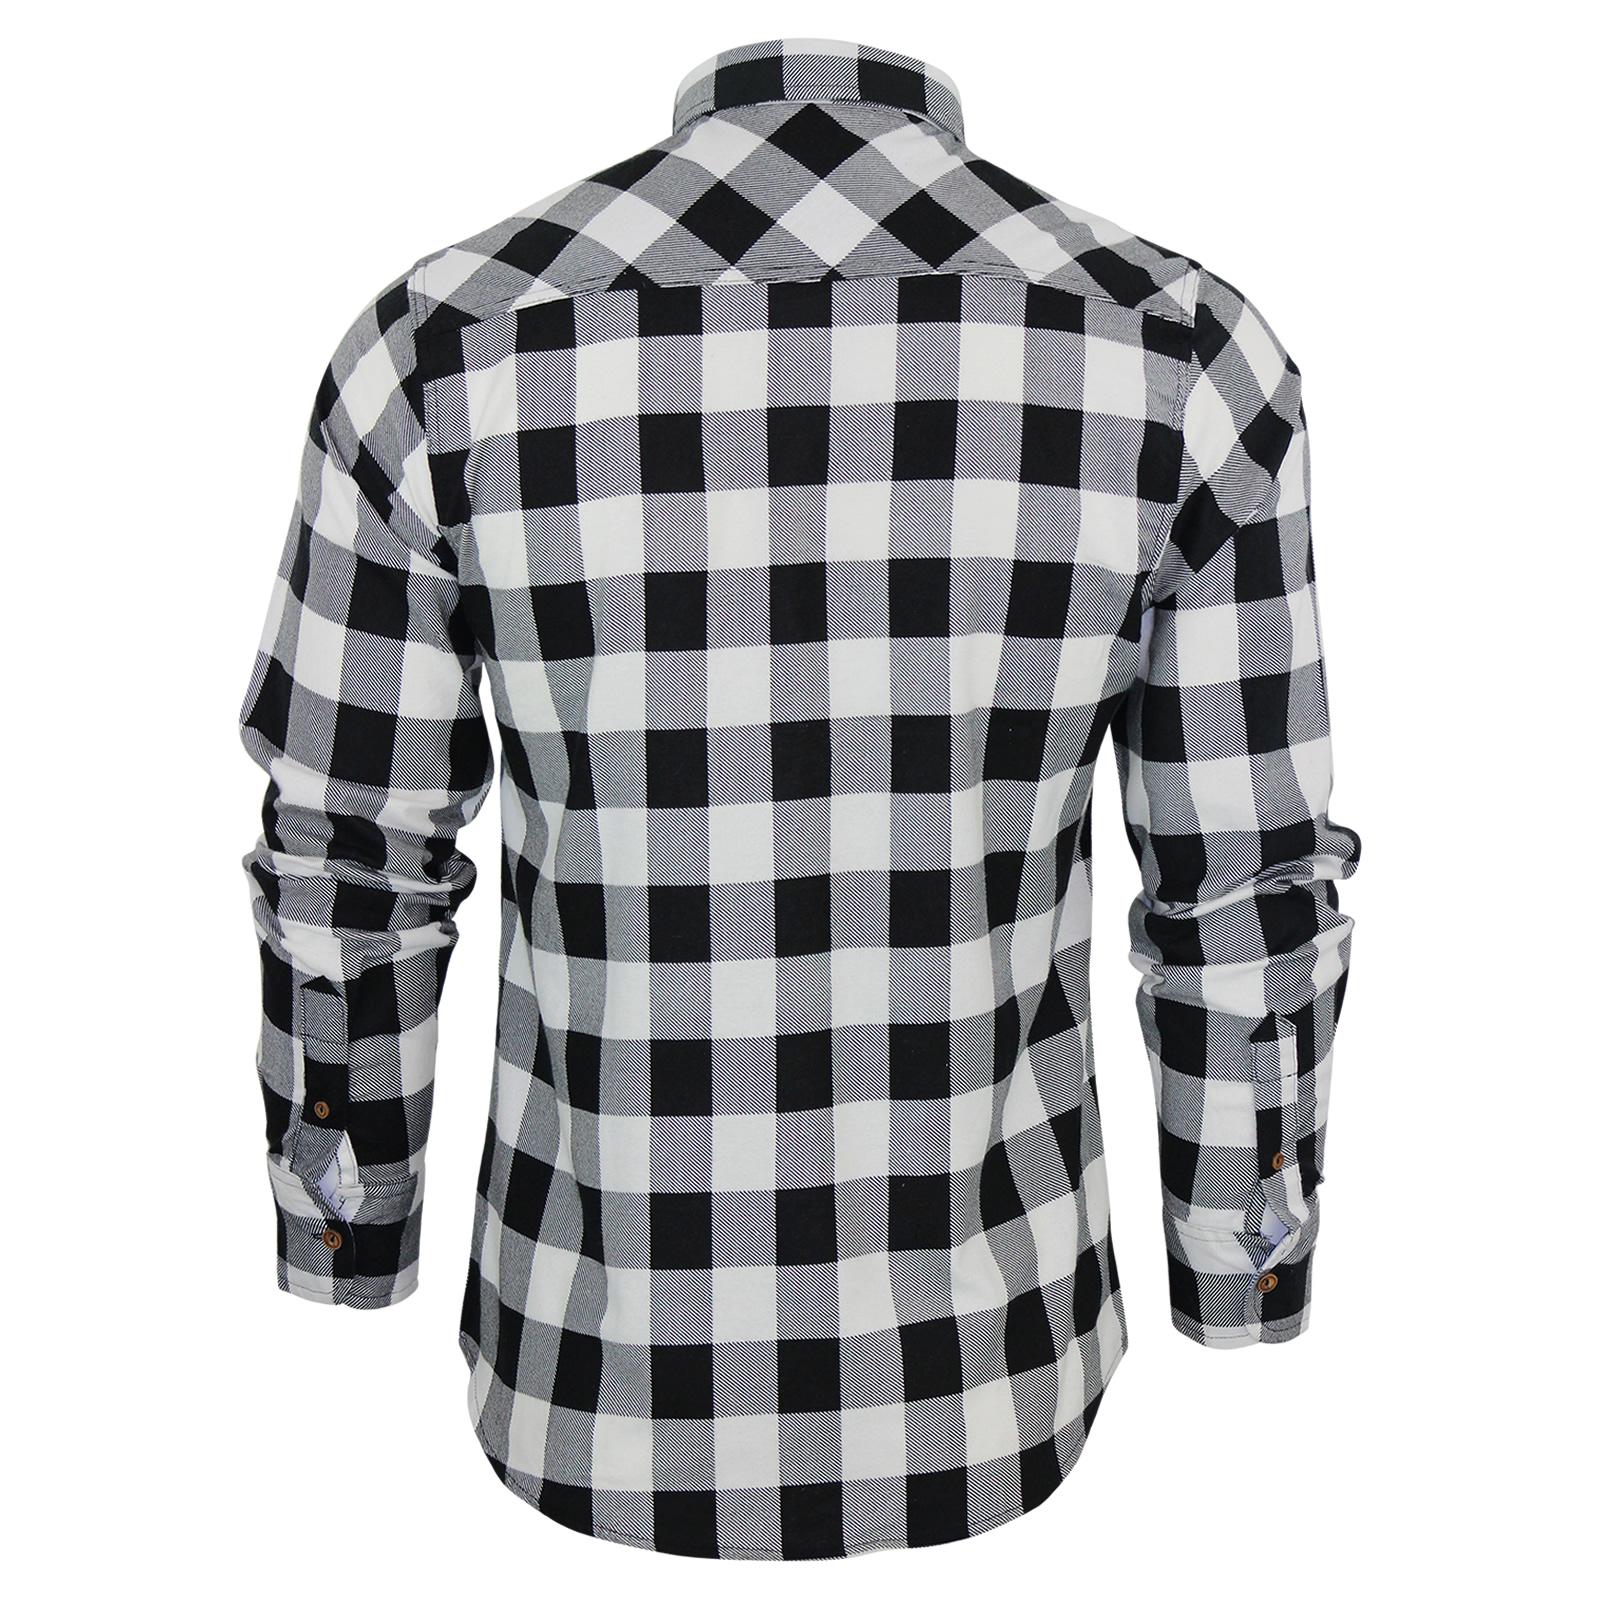 Black and white checkered shirt mens custom shirt for Black and white check mens shirt